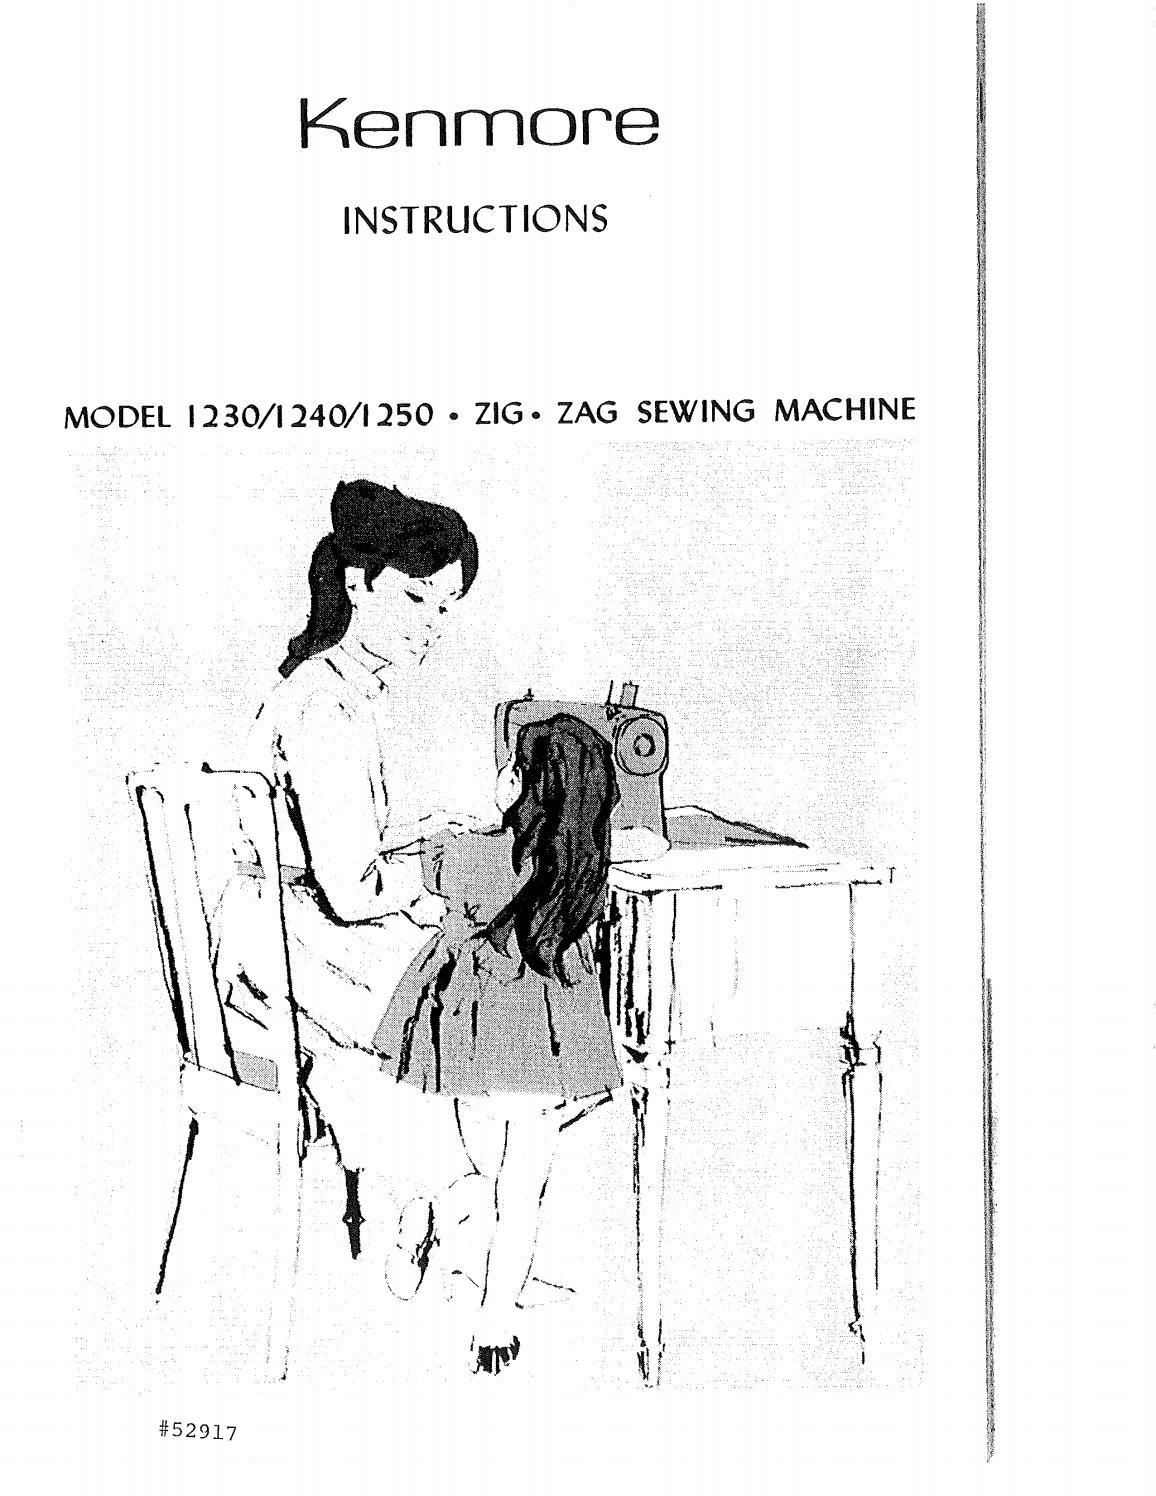 Kenmore 1230 sewing machine user manual by David Mannock